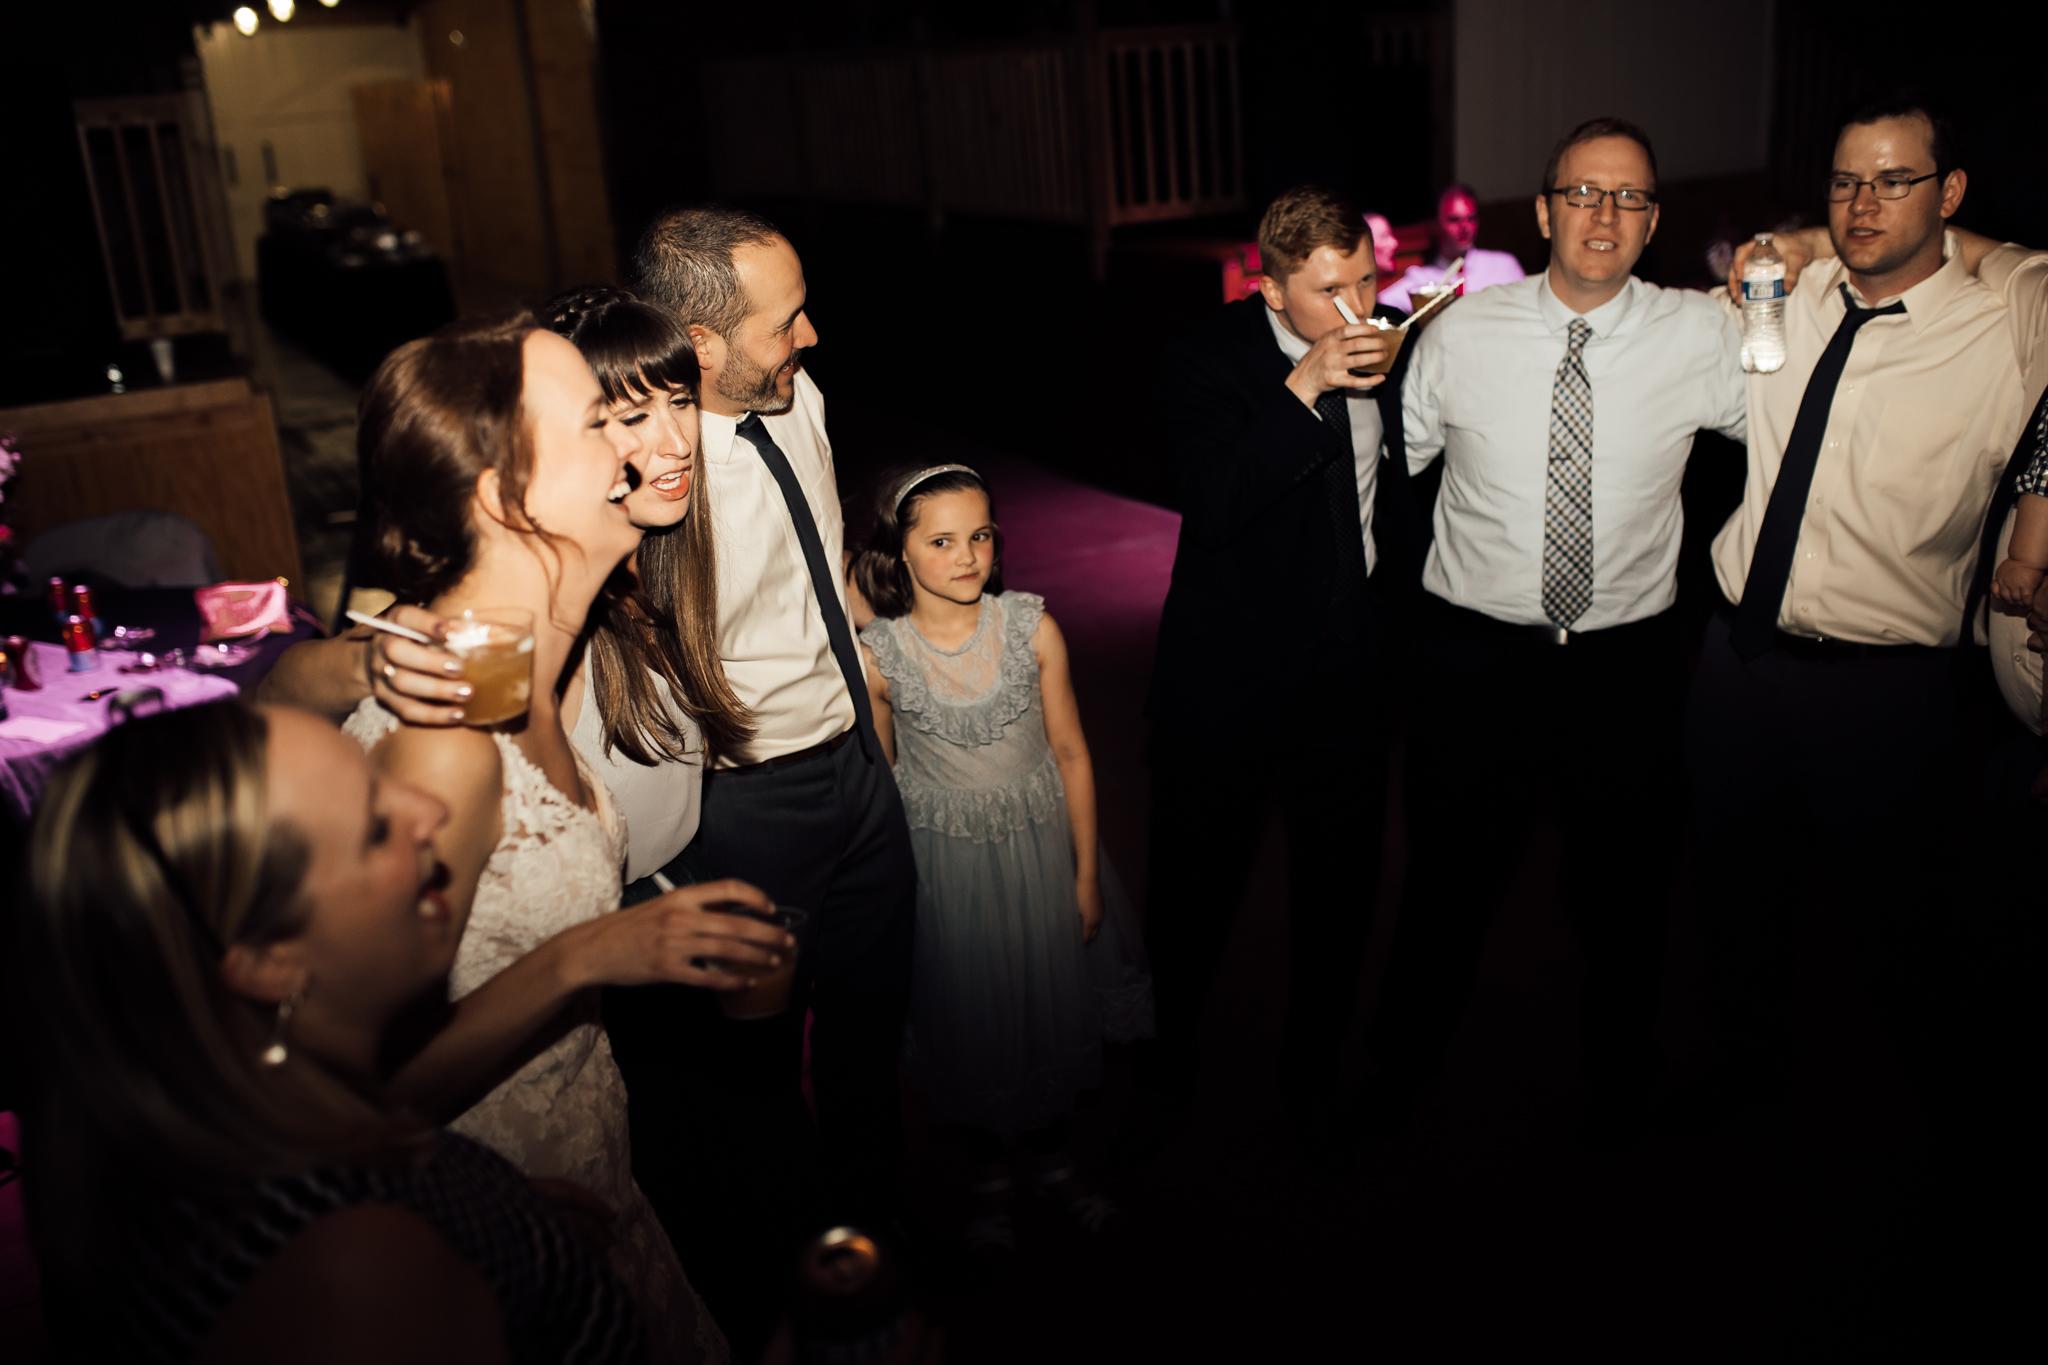 birmingham-alabama-wedding-photographer-laura-terry-the-warmth-around-you (105 of 110).jpg